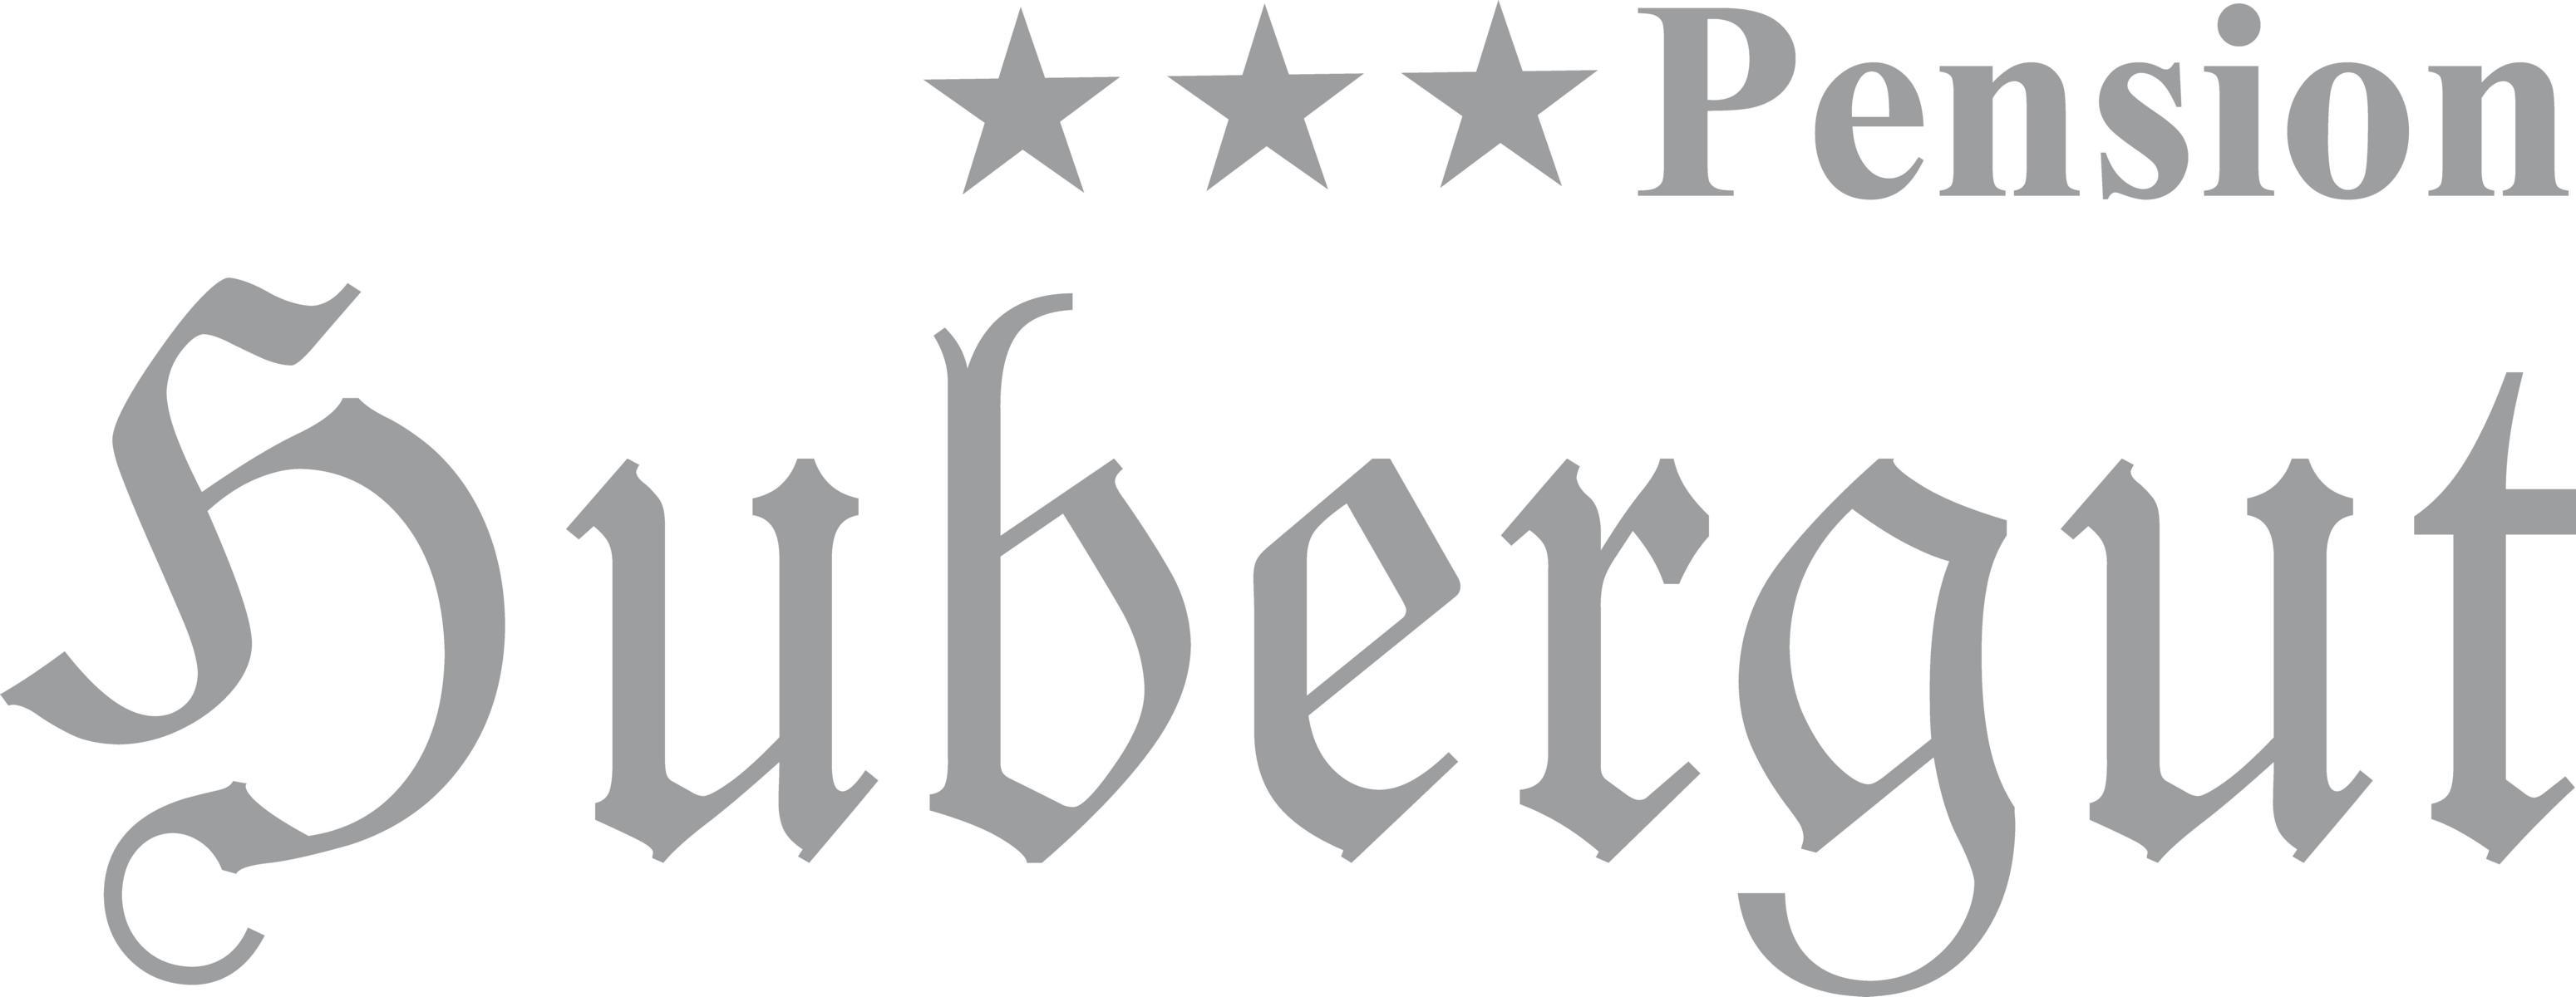 Hubergut Logo